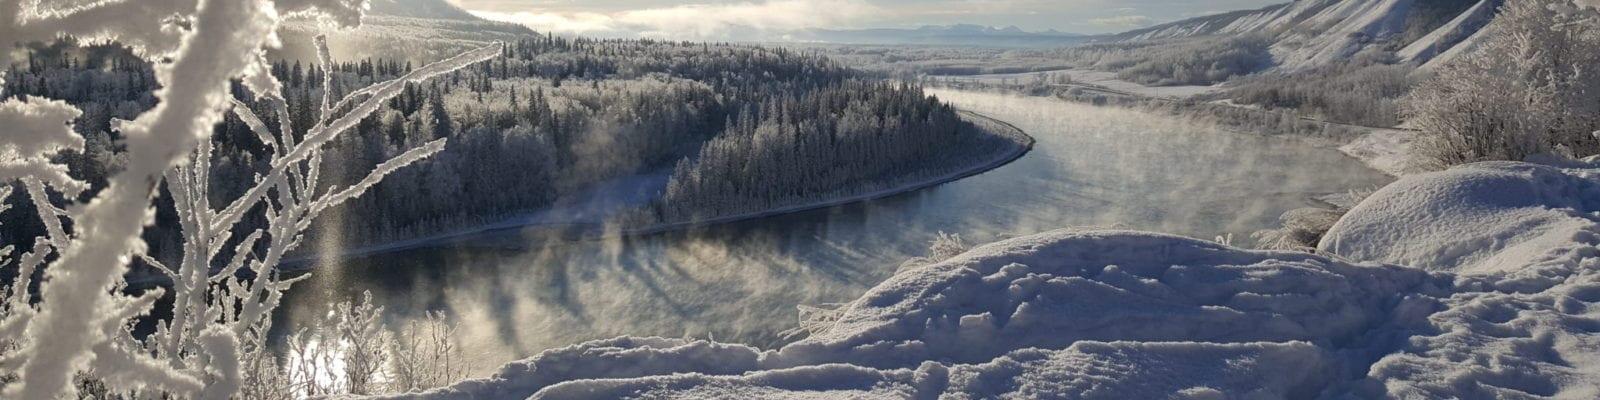 snow peace river – steve twa